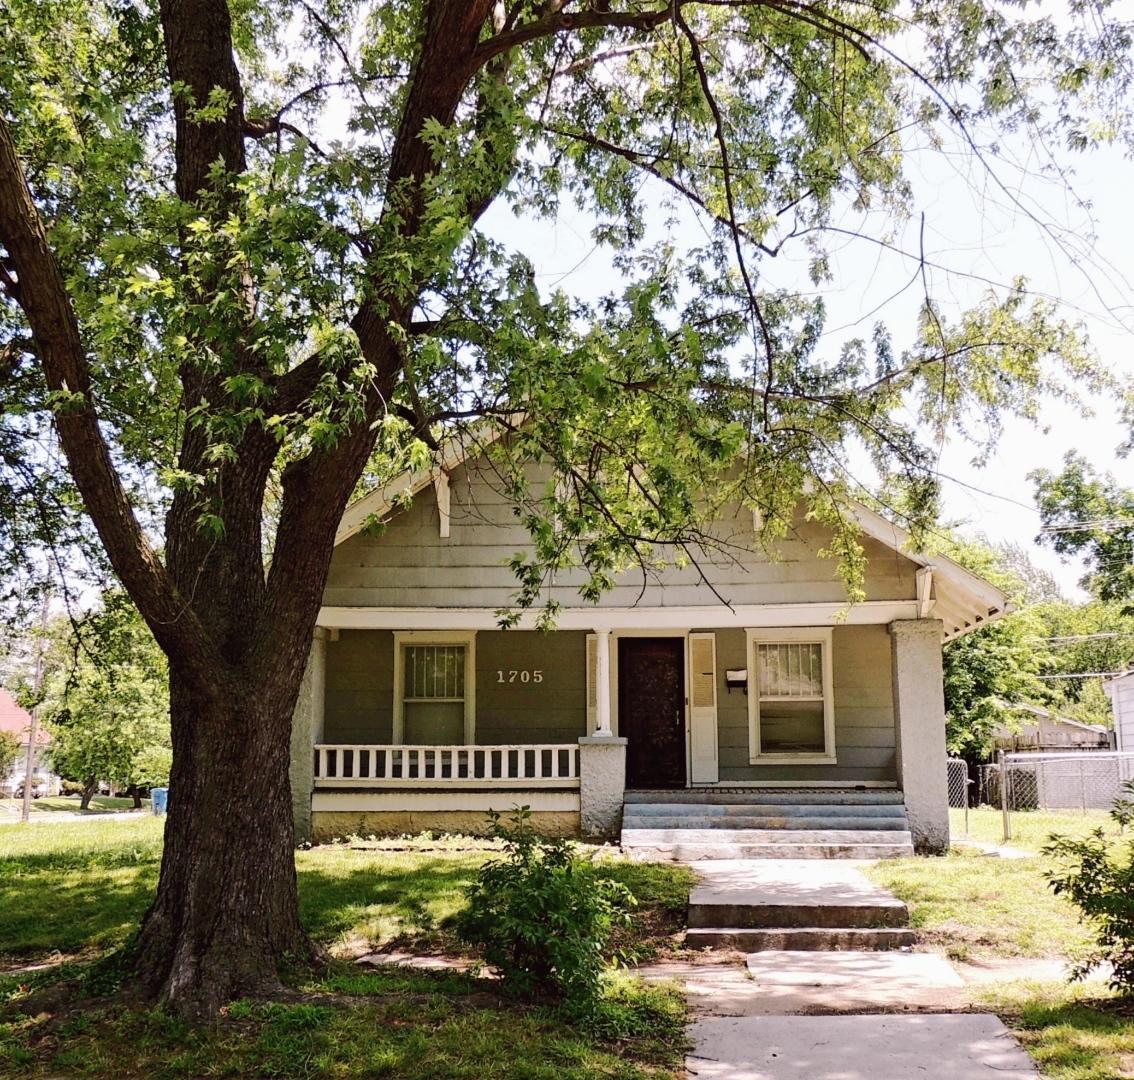 1705 South Bird Avenue Joplin, MO 64801